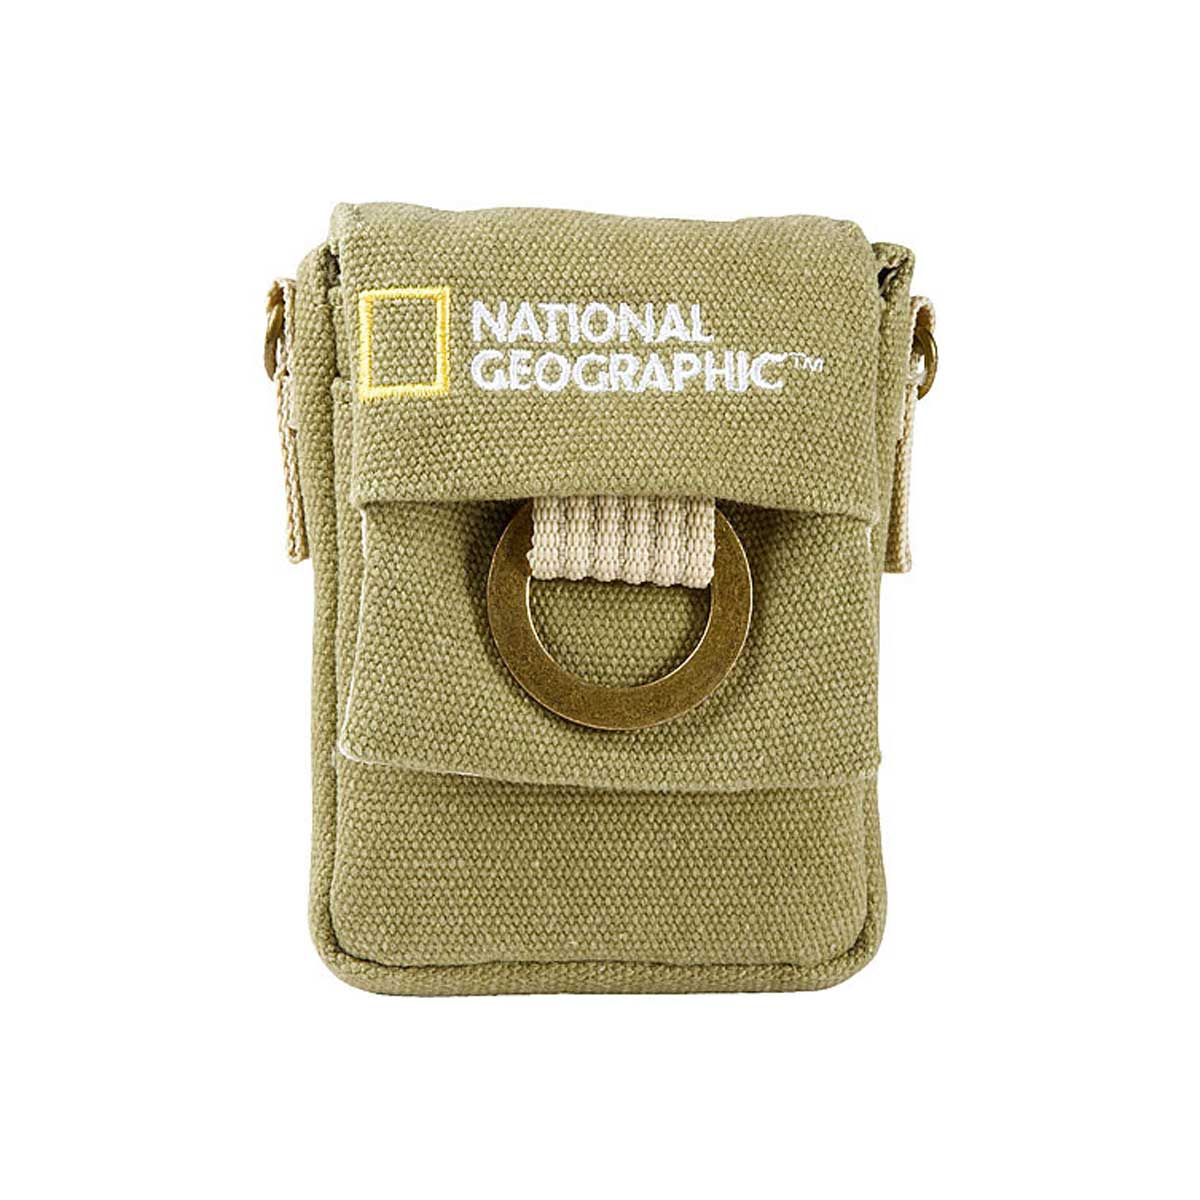 کیف دوربین NG 1147 نشنال جئوگرافیک  National Geographic 1147 Little Camera Pouch